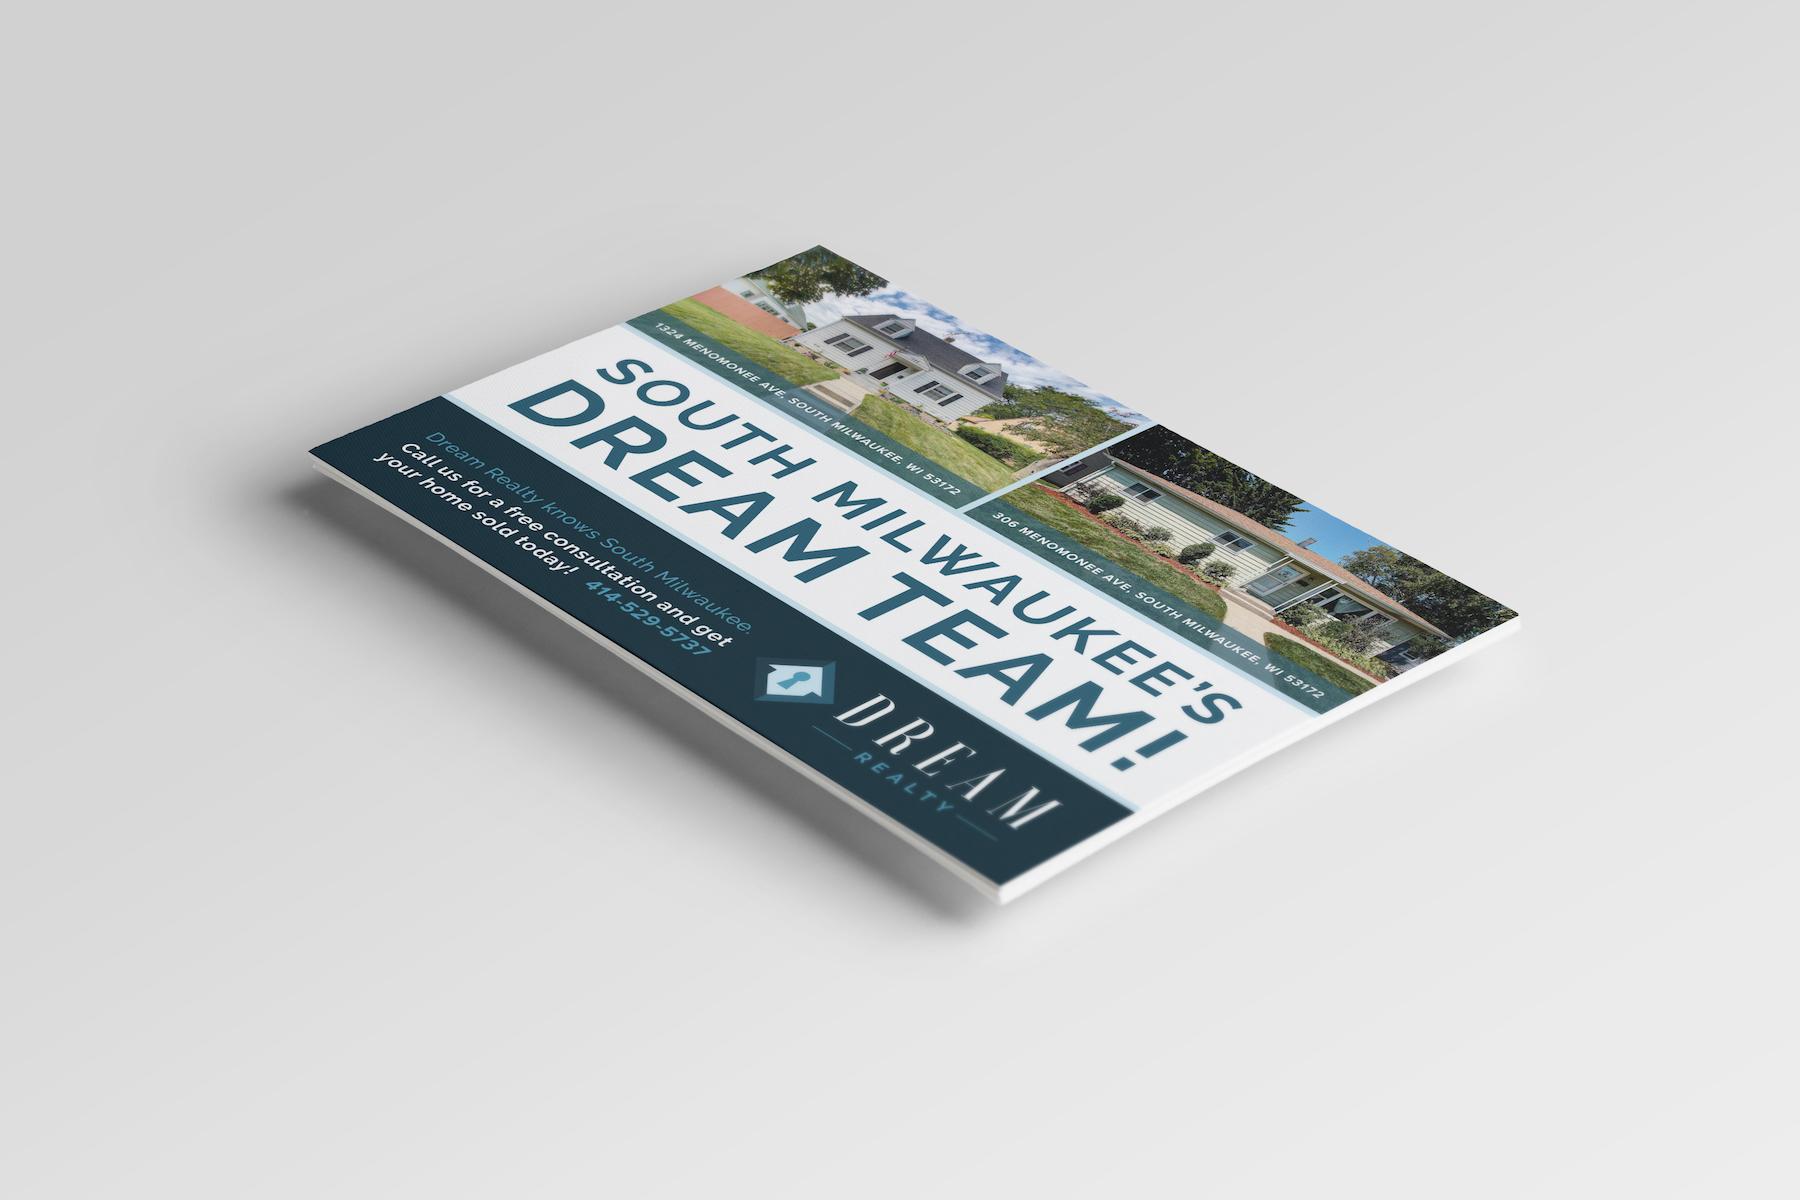 Golden-Antler-Design-Milwaukee-Wisconsin-Branding-Print-Web-Serivces-Direct-Mail-EDDM-Postcards-Dream-Realty